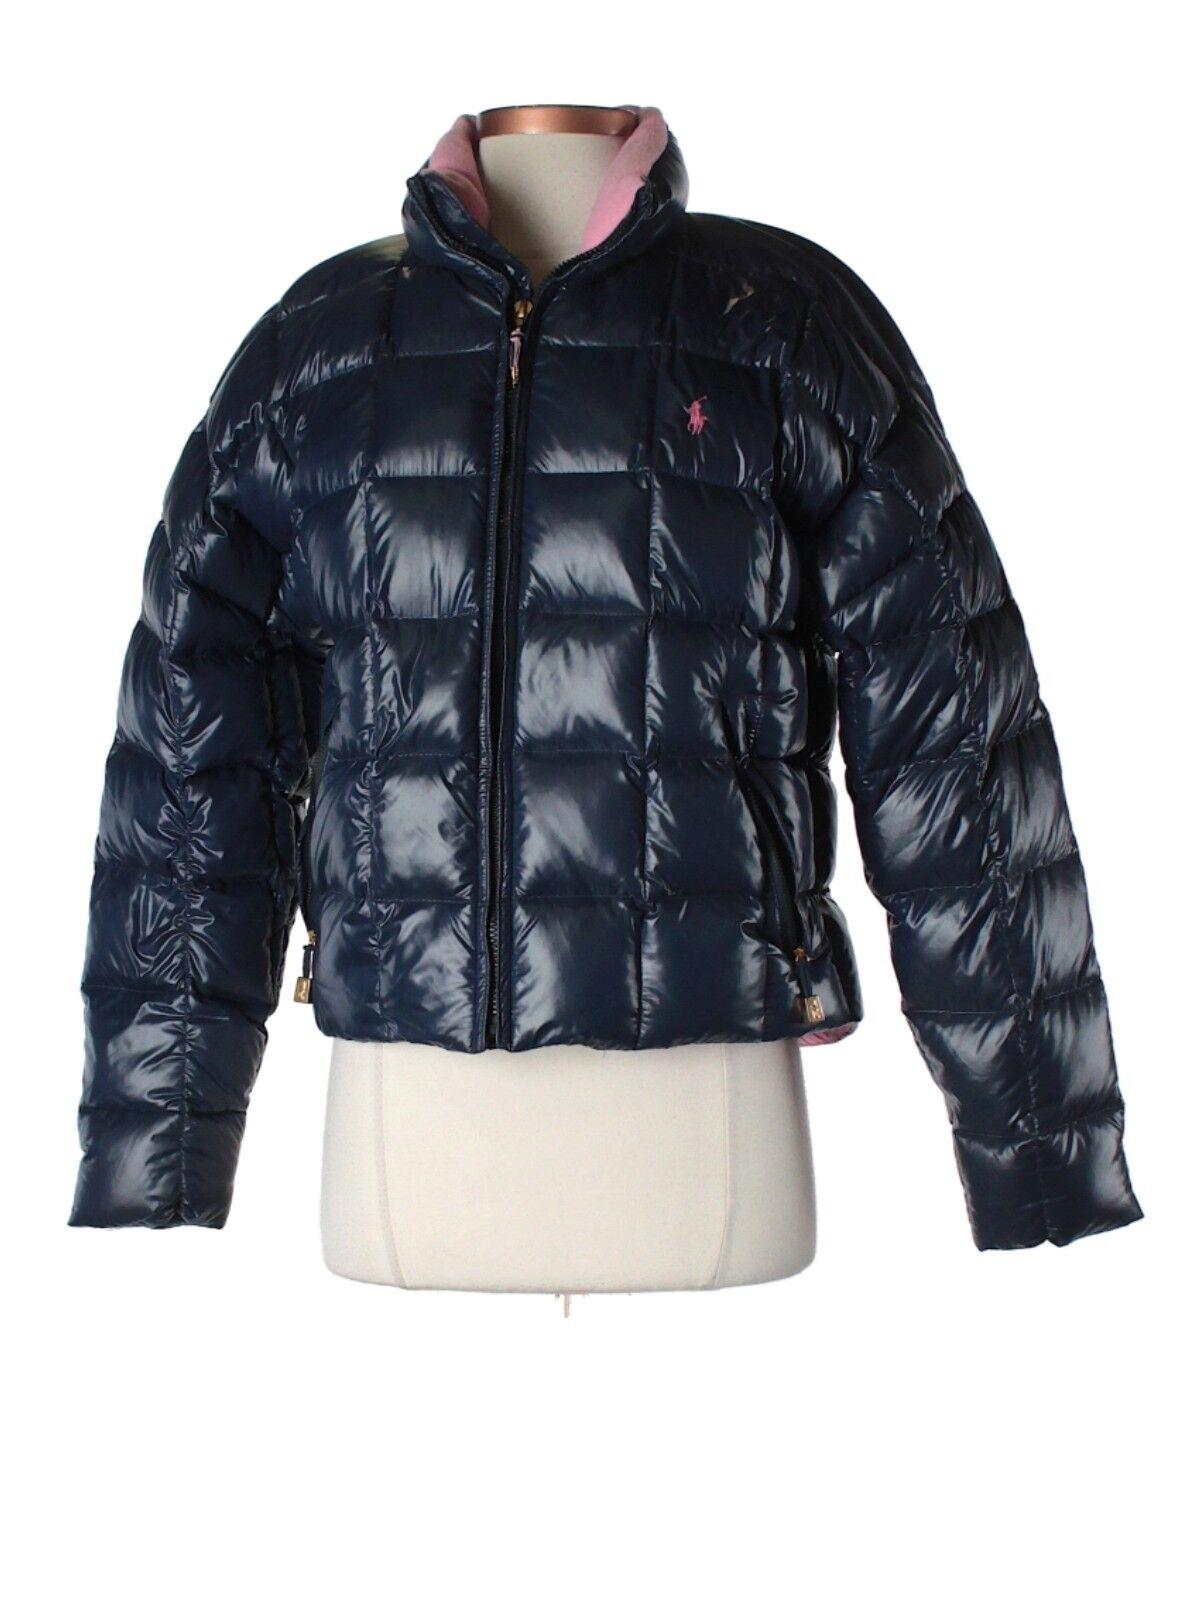 Women Ralph Lauren Sport Navy bluee Pink Shiny Puffer Down Winter Coat Size XS